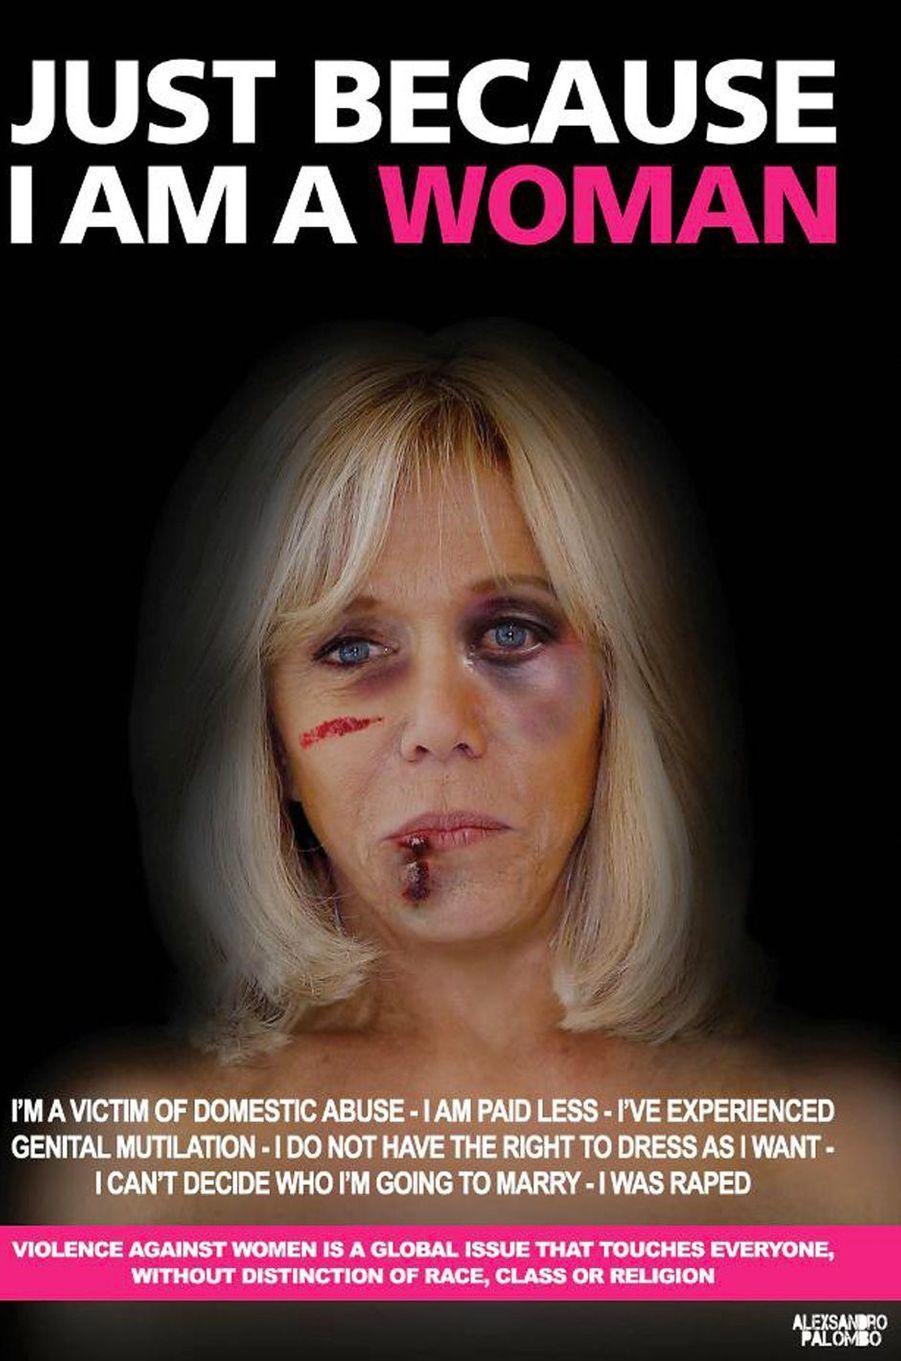 La campagne«Just because I am a Woman» de l'artisteAleXsandro Palombo. IciBrigitte Macron.